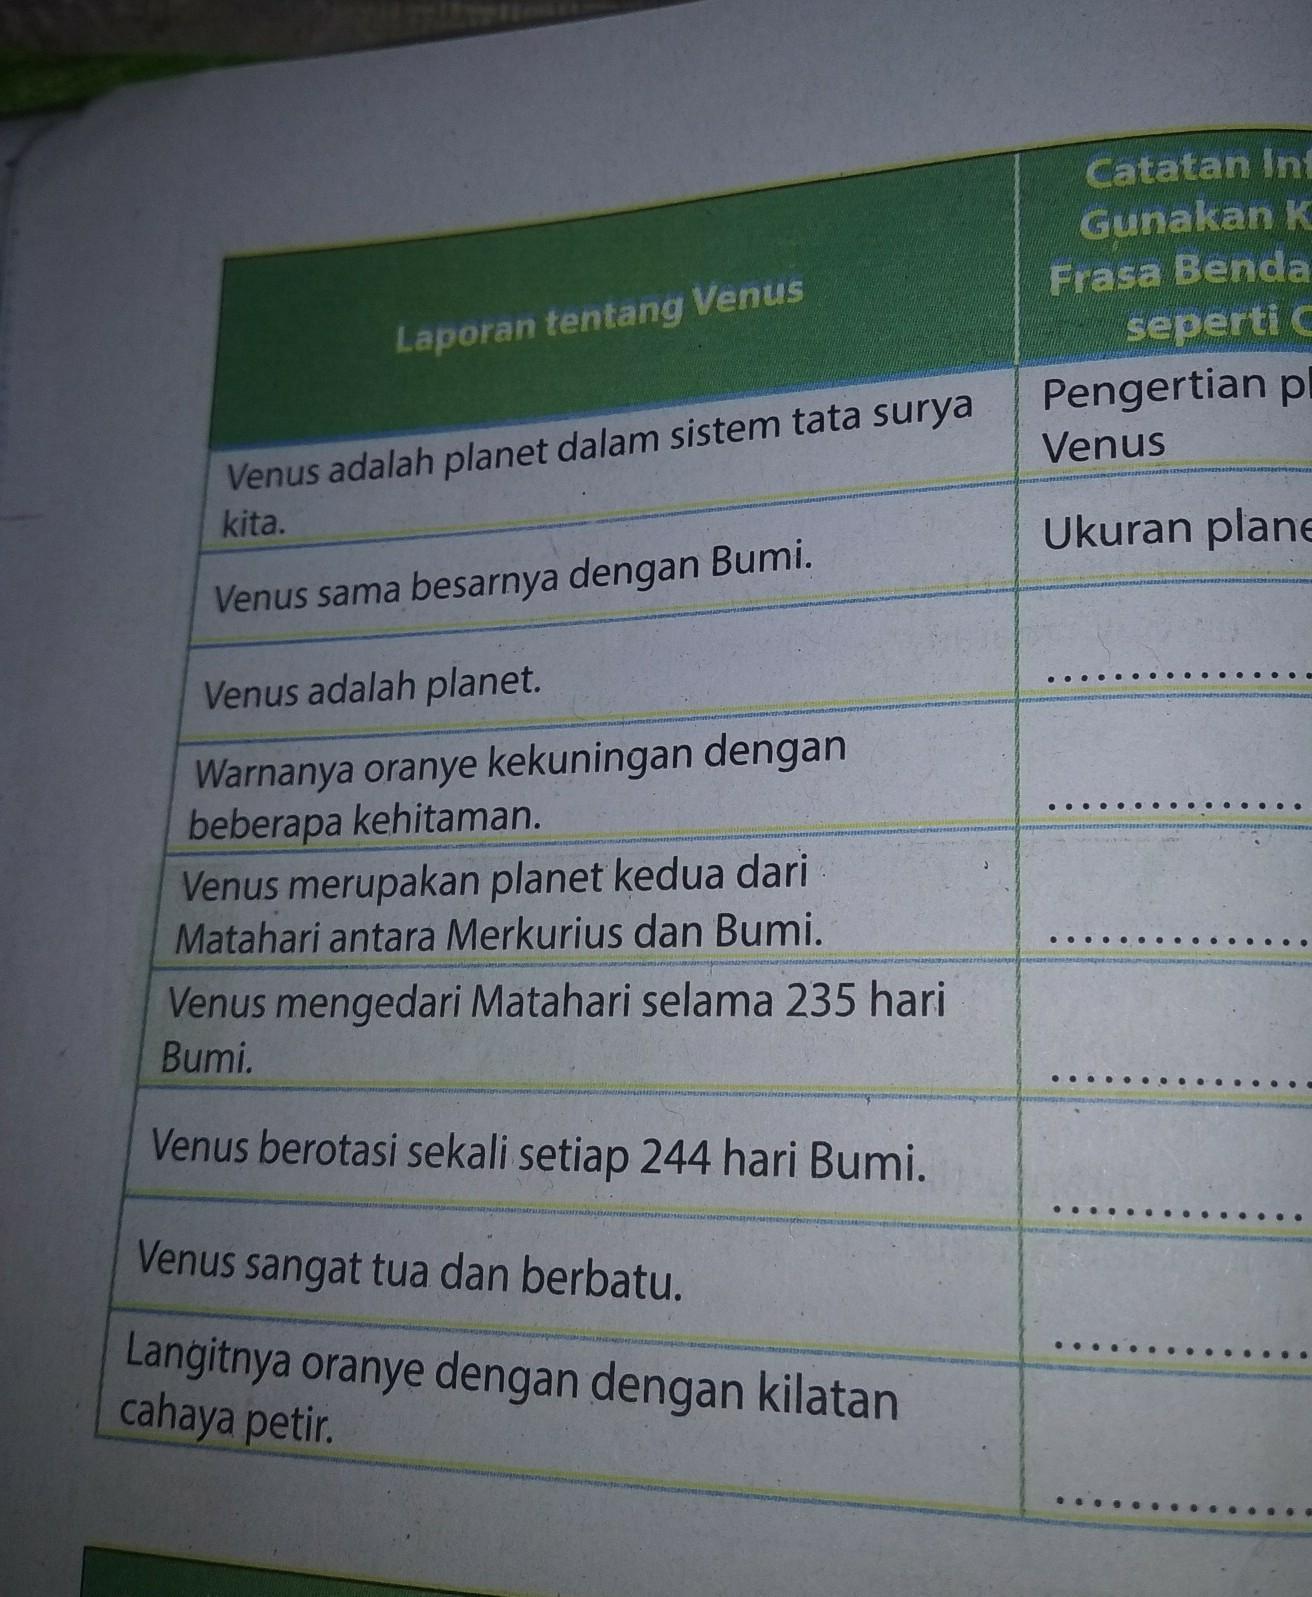 Kunci jawaban mandiri bahasa indonesia smp kur 13 pdf jawaban buku bahasa indonesia kelas 9 semester. Jawaban Bahasa Indonesia Kelas 9 Kegiatan 2 Halaman 14 Brainly Co Id